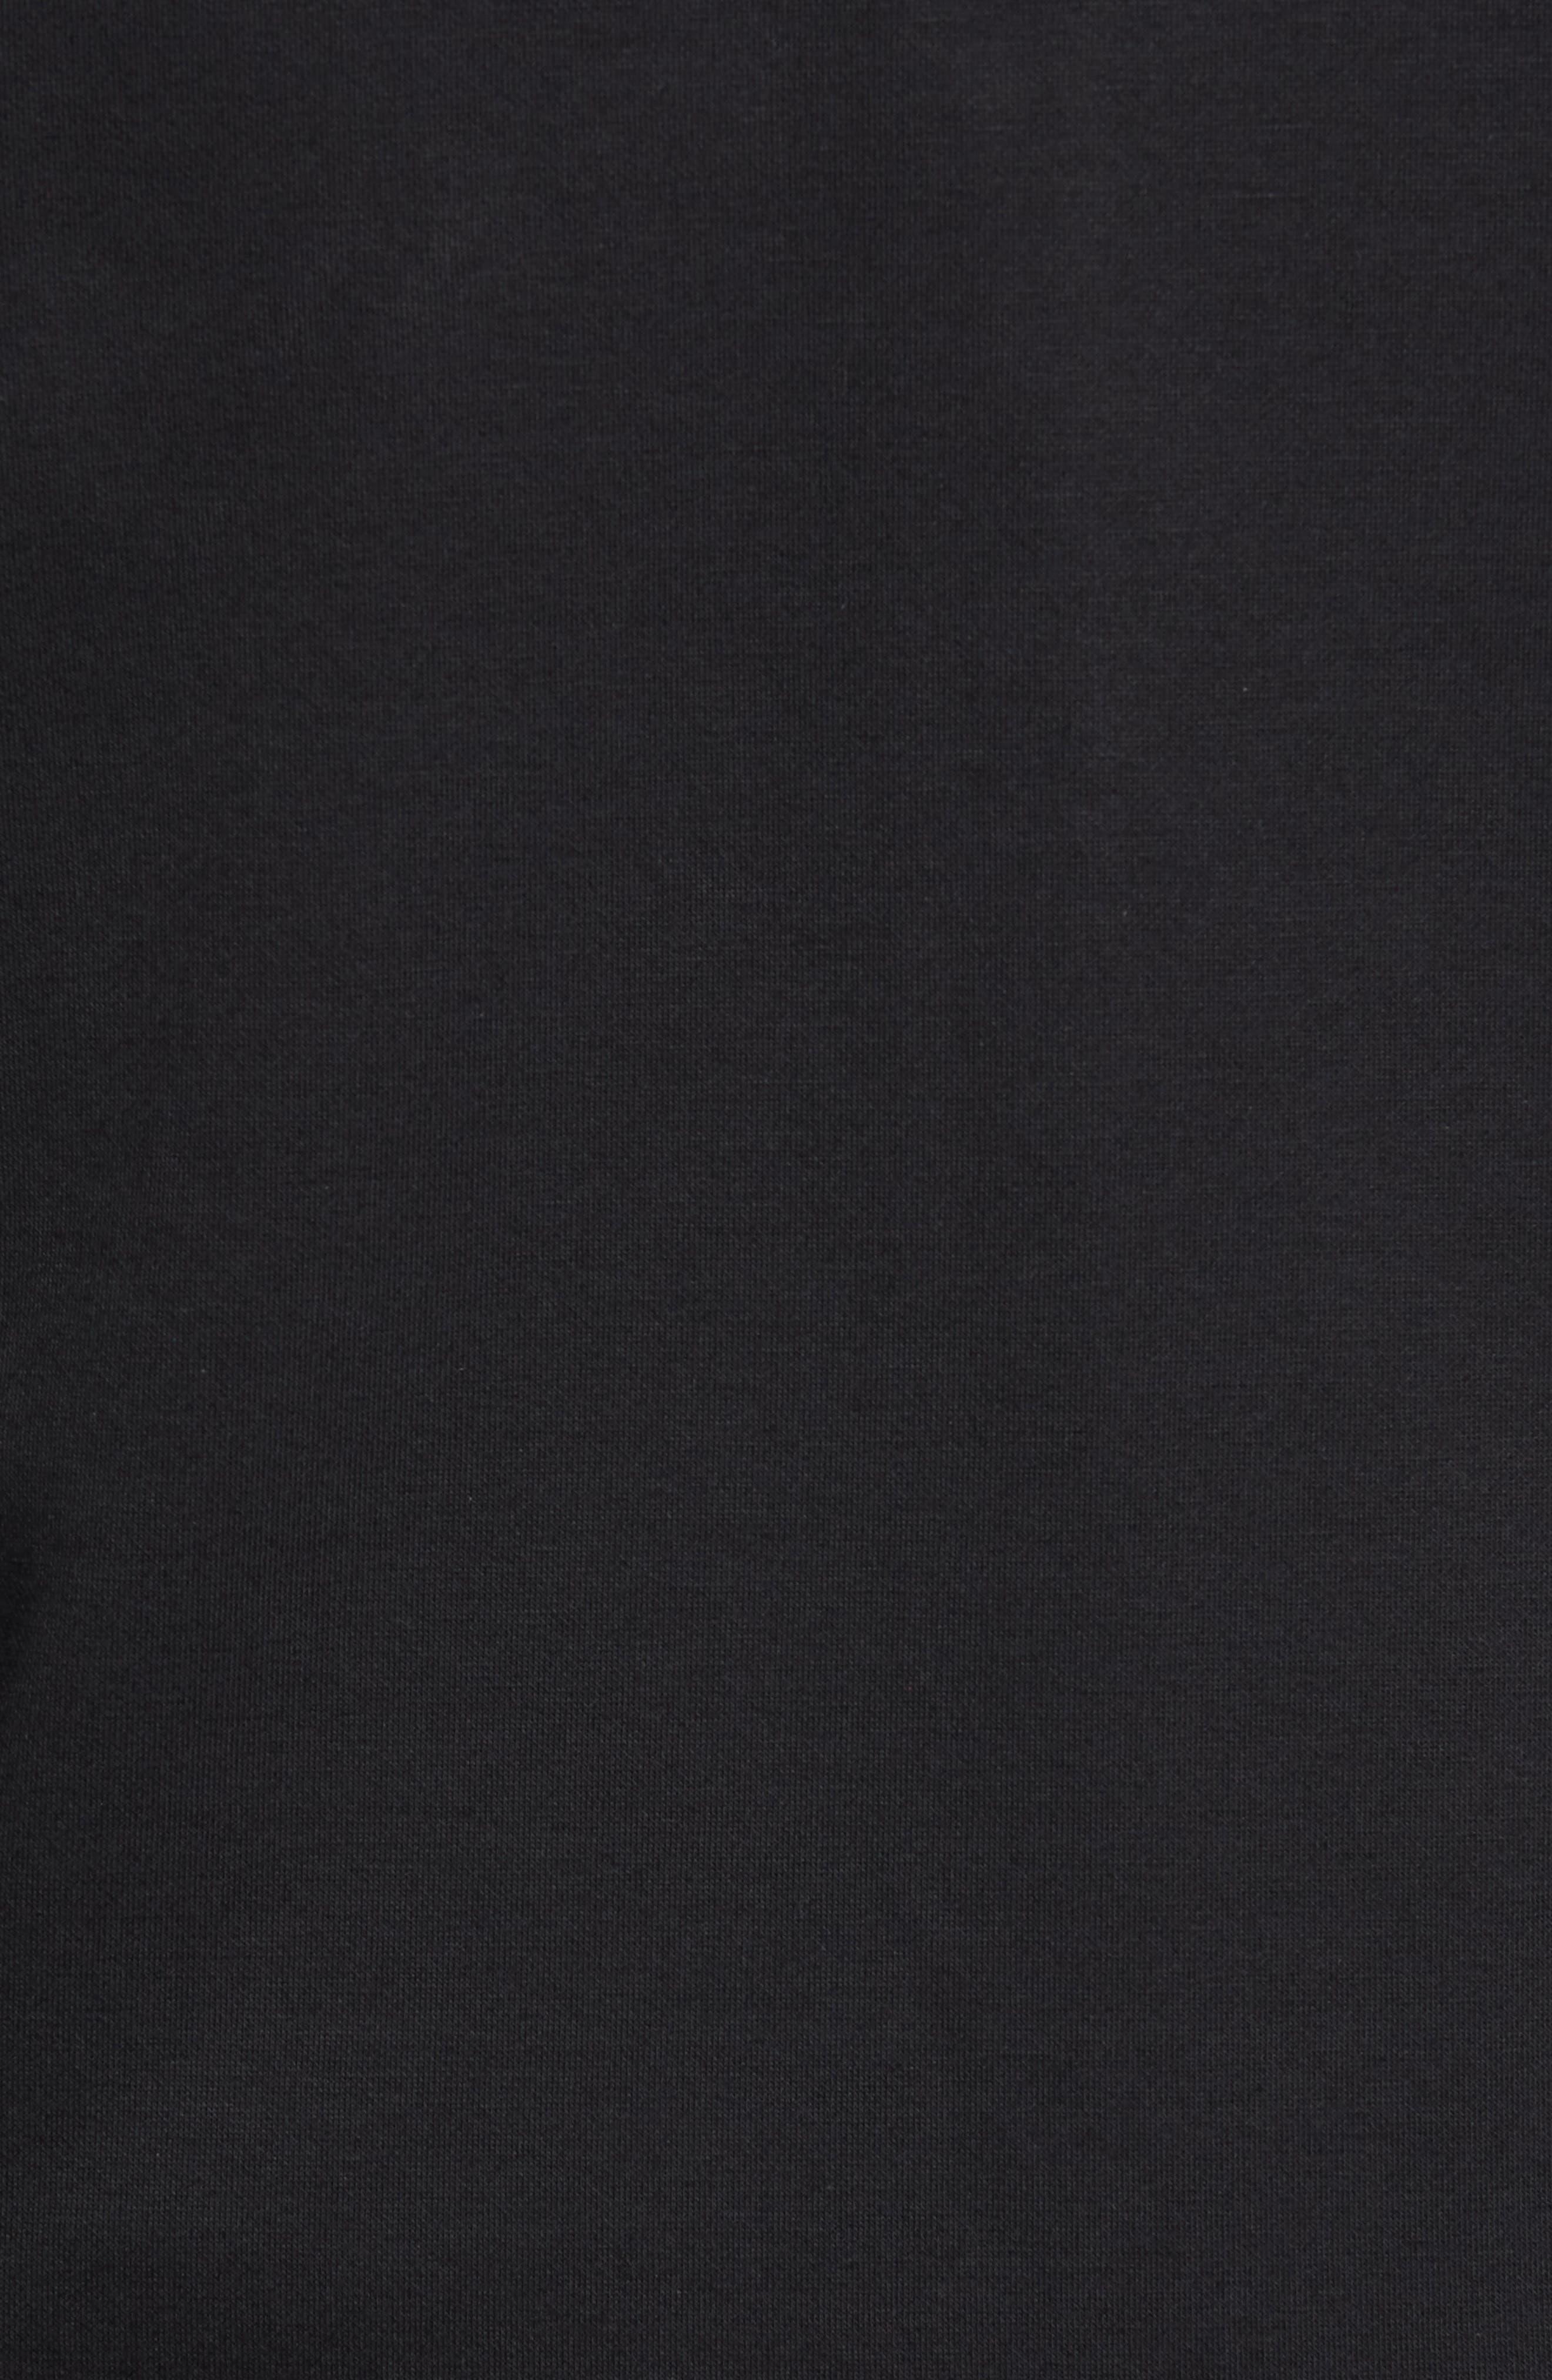 Soule Slim Fit Moto Jacket,                             Alternate thumbnail 6, color,                             BLACK